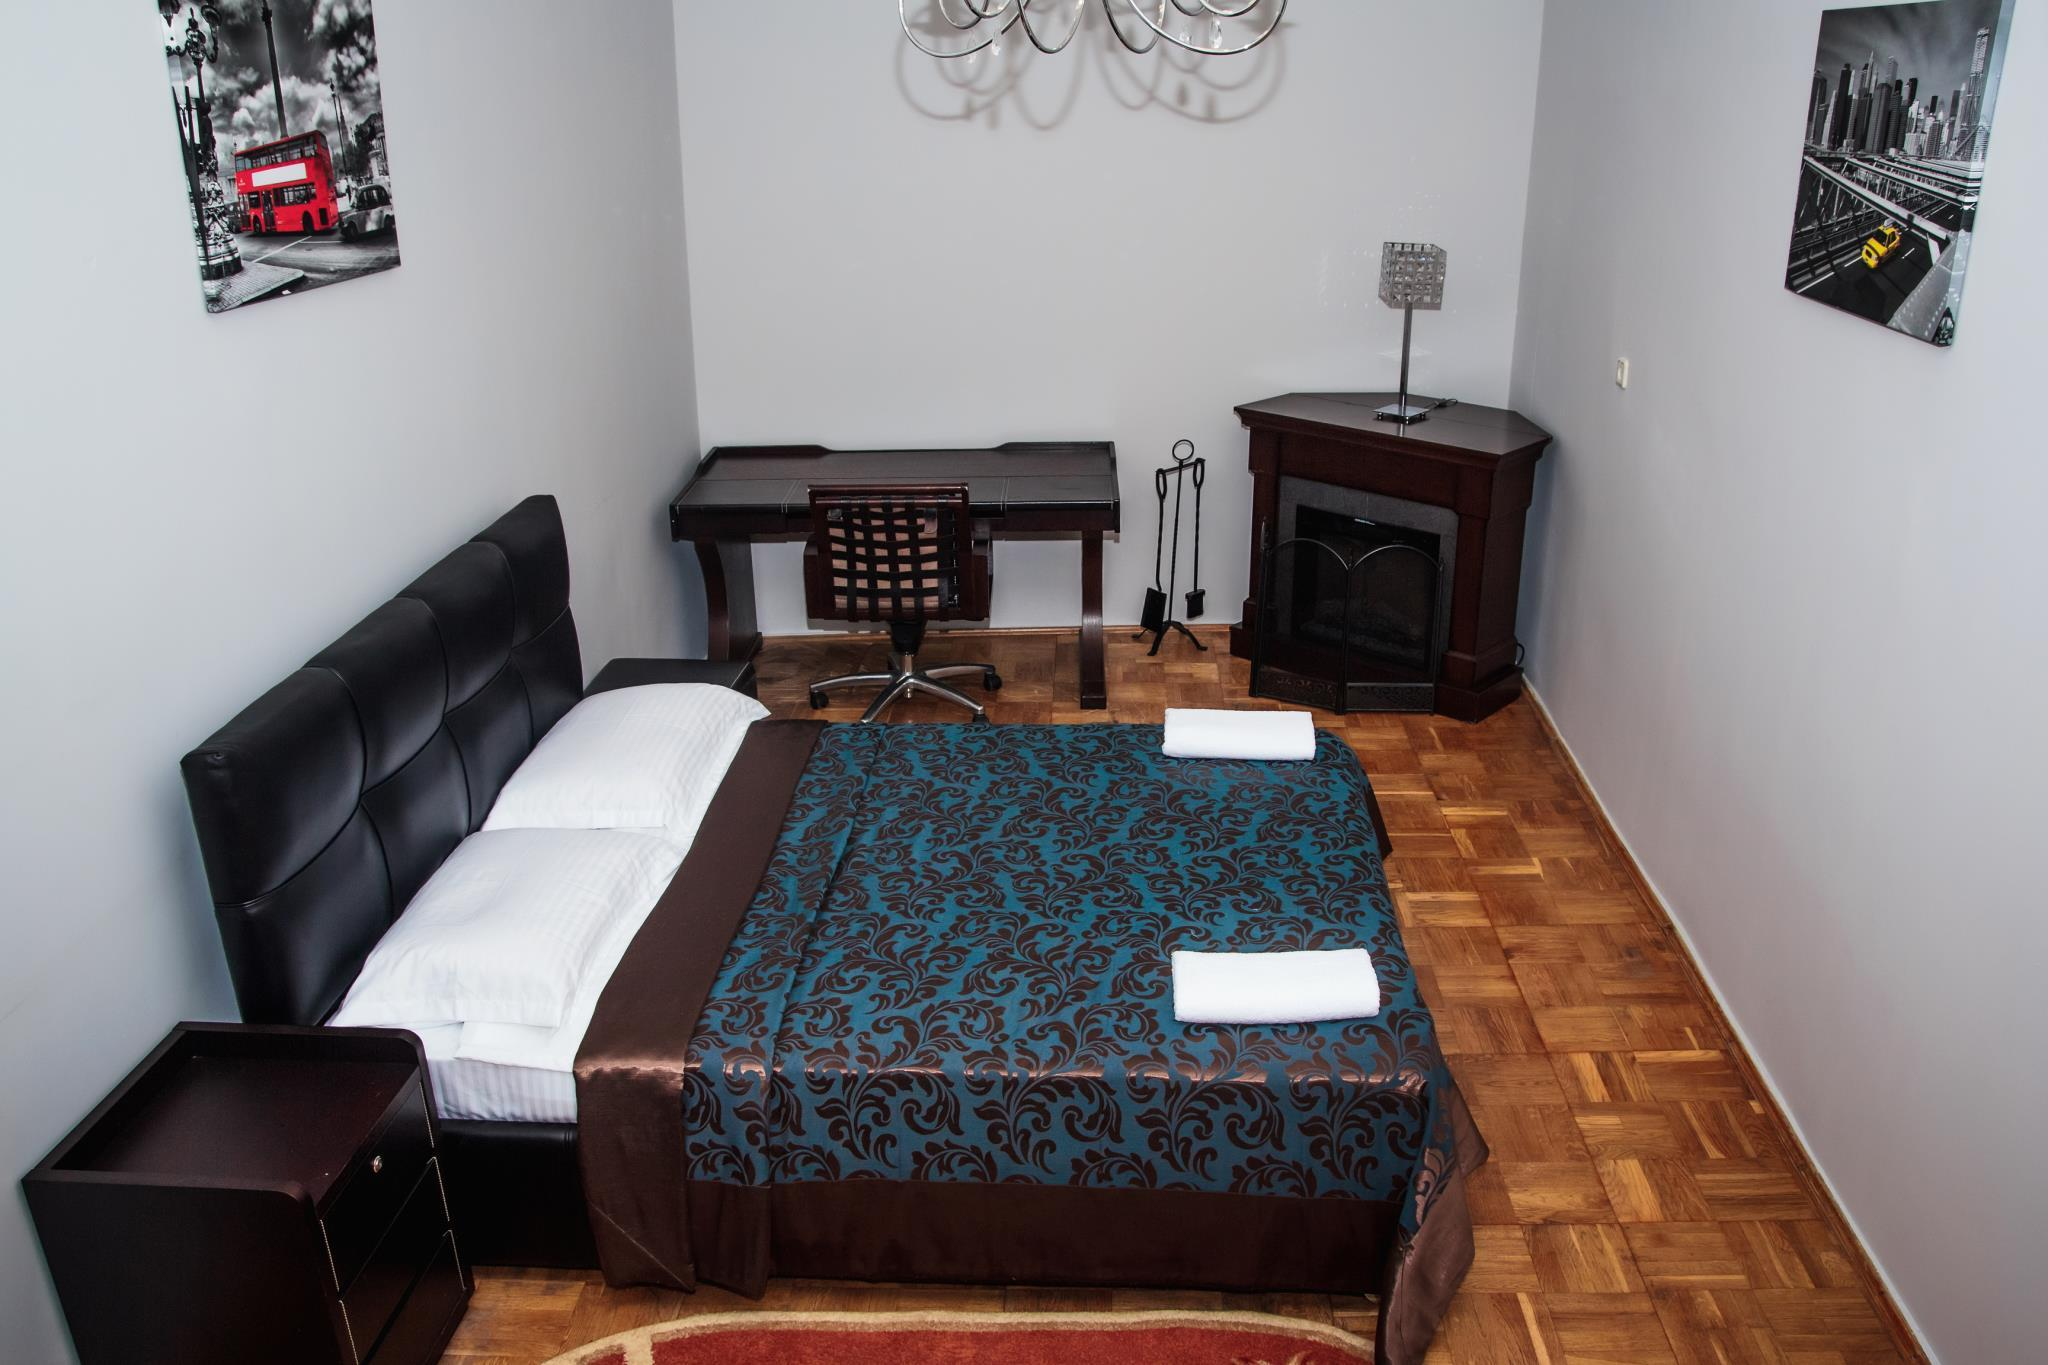 Two Bedrooms Apartment On Kostyushka 16 13  V.I.P.